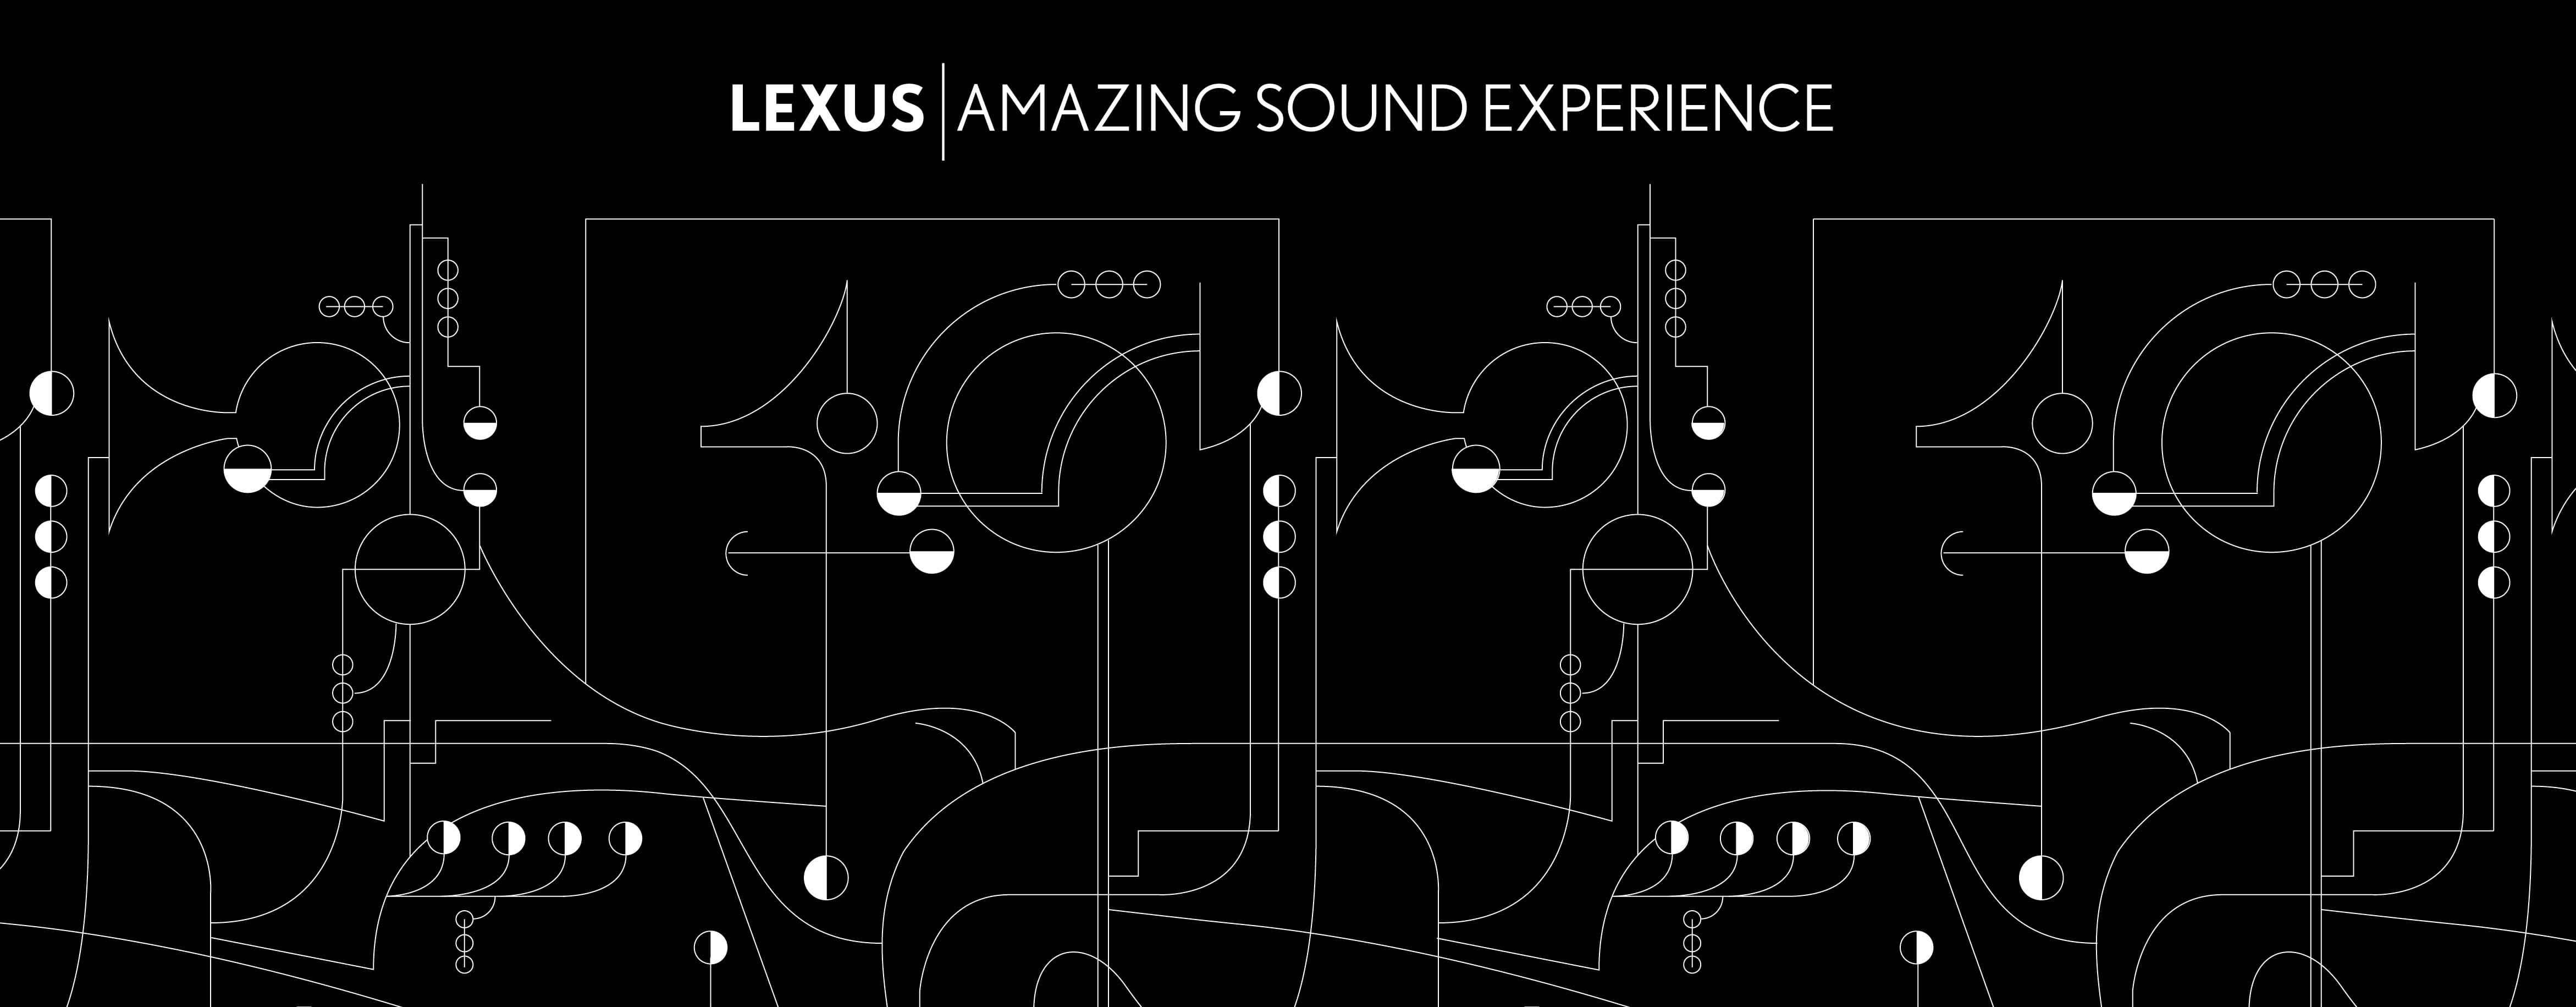 incontri-d-musica-lexus-amazing-sound-experience-brand-activation-grafica-muro-2